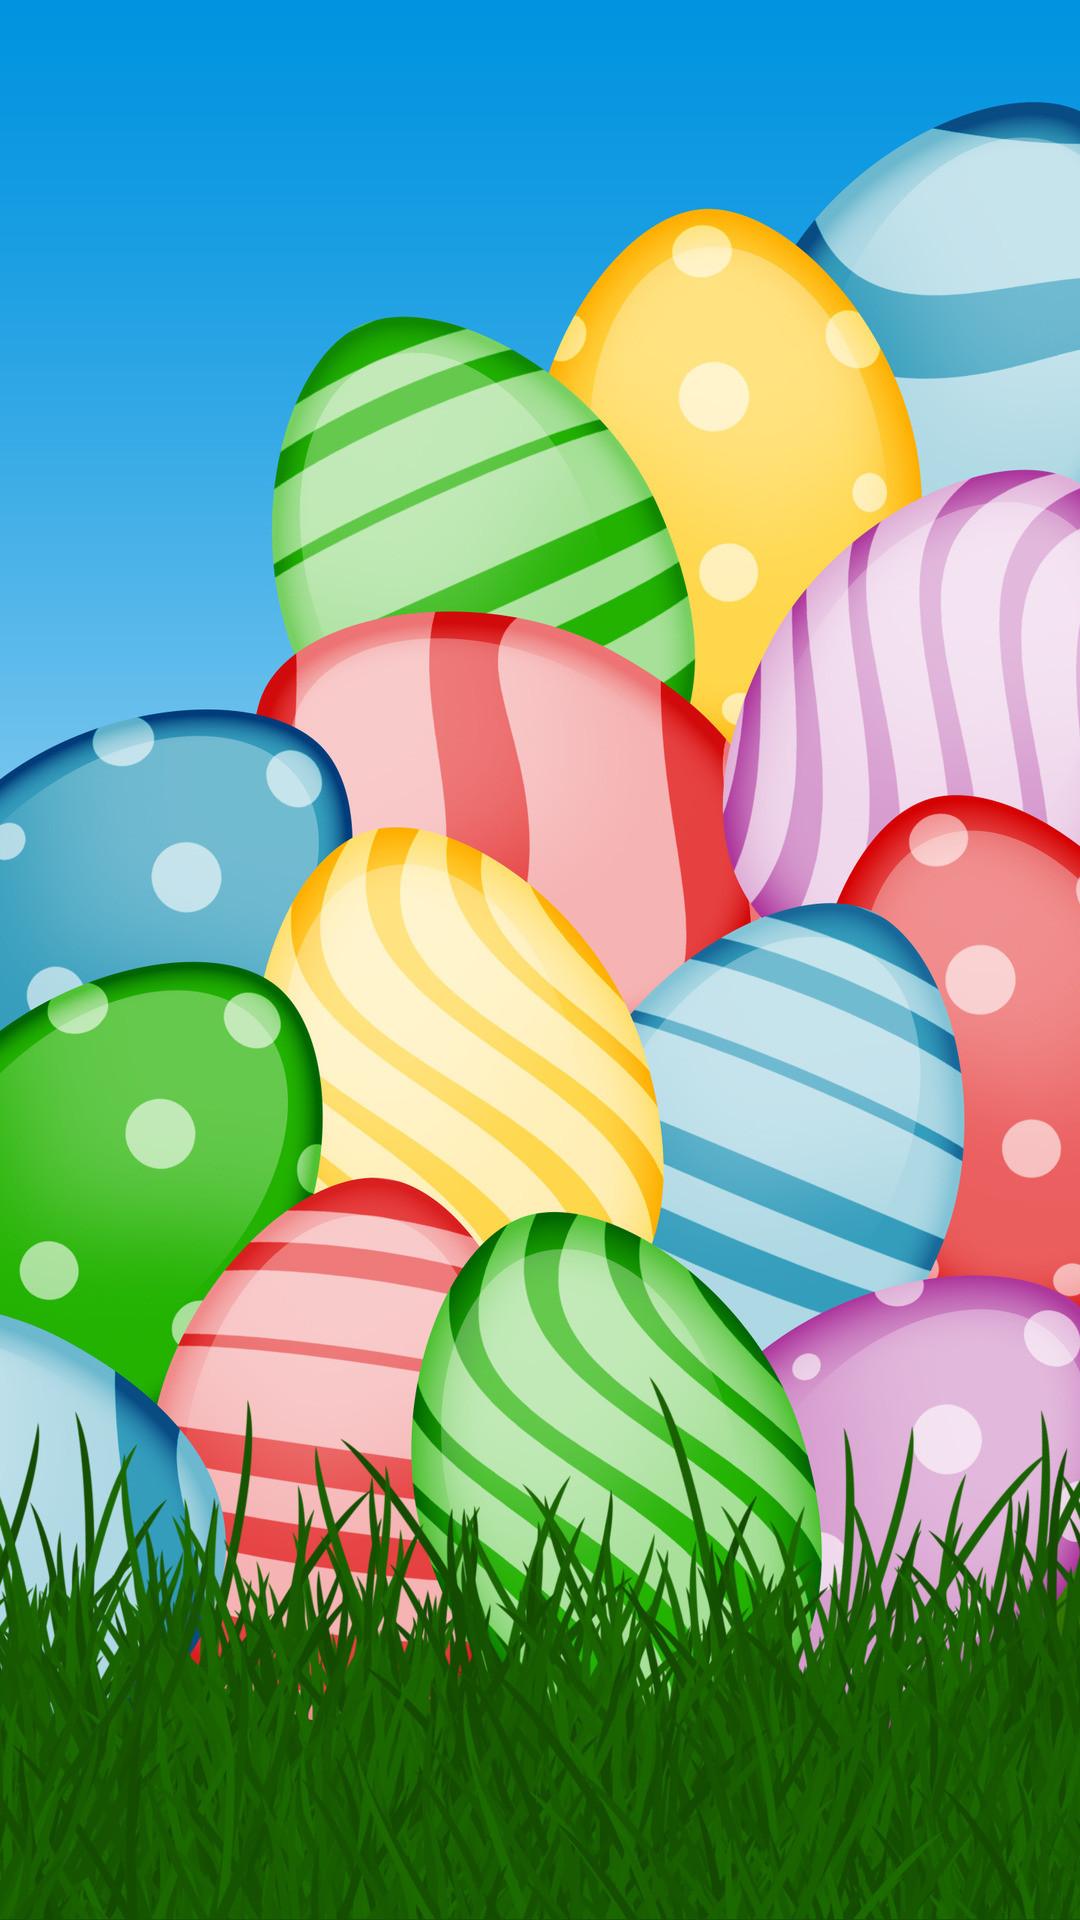 Easter Eggs Wallpaper 70 Images